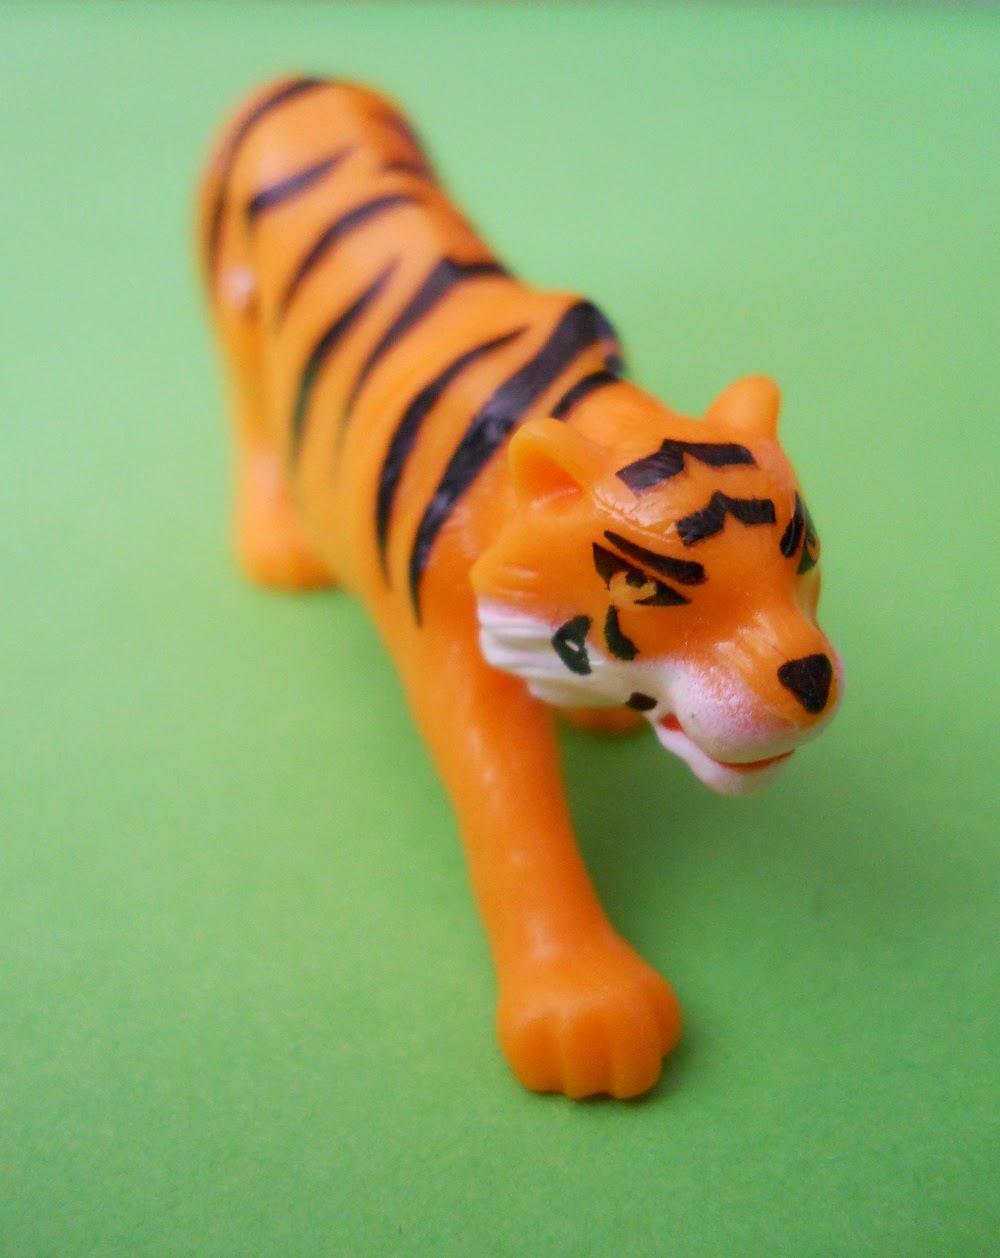 tigre de regalo de huevo kinder sorpresa